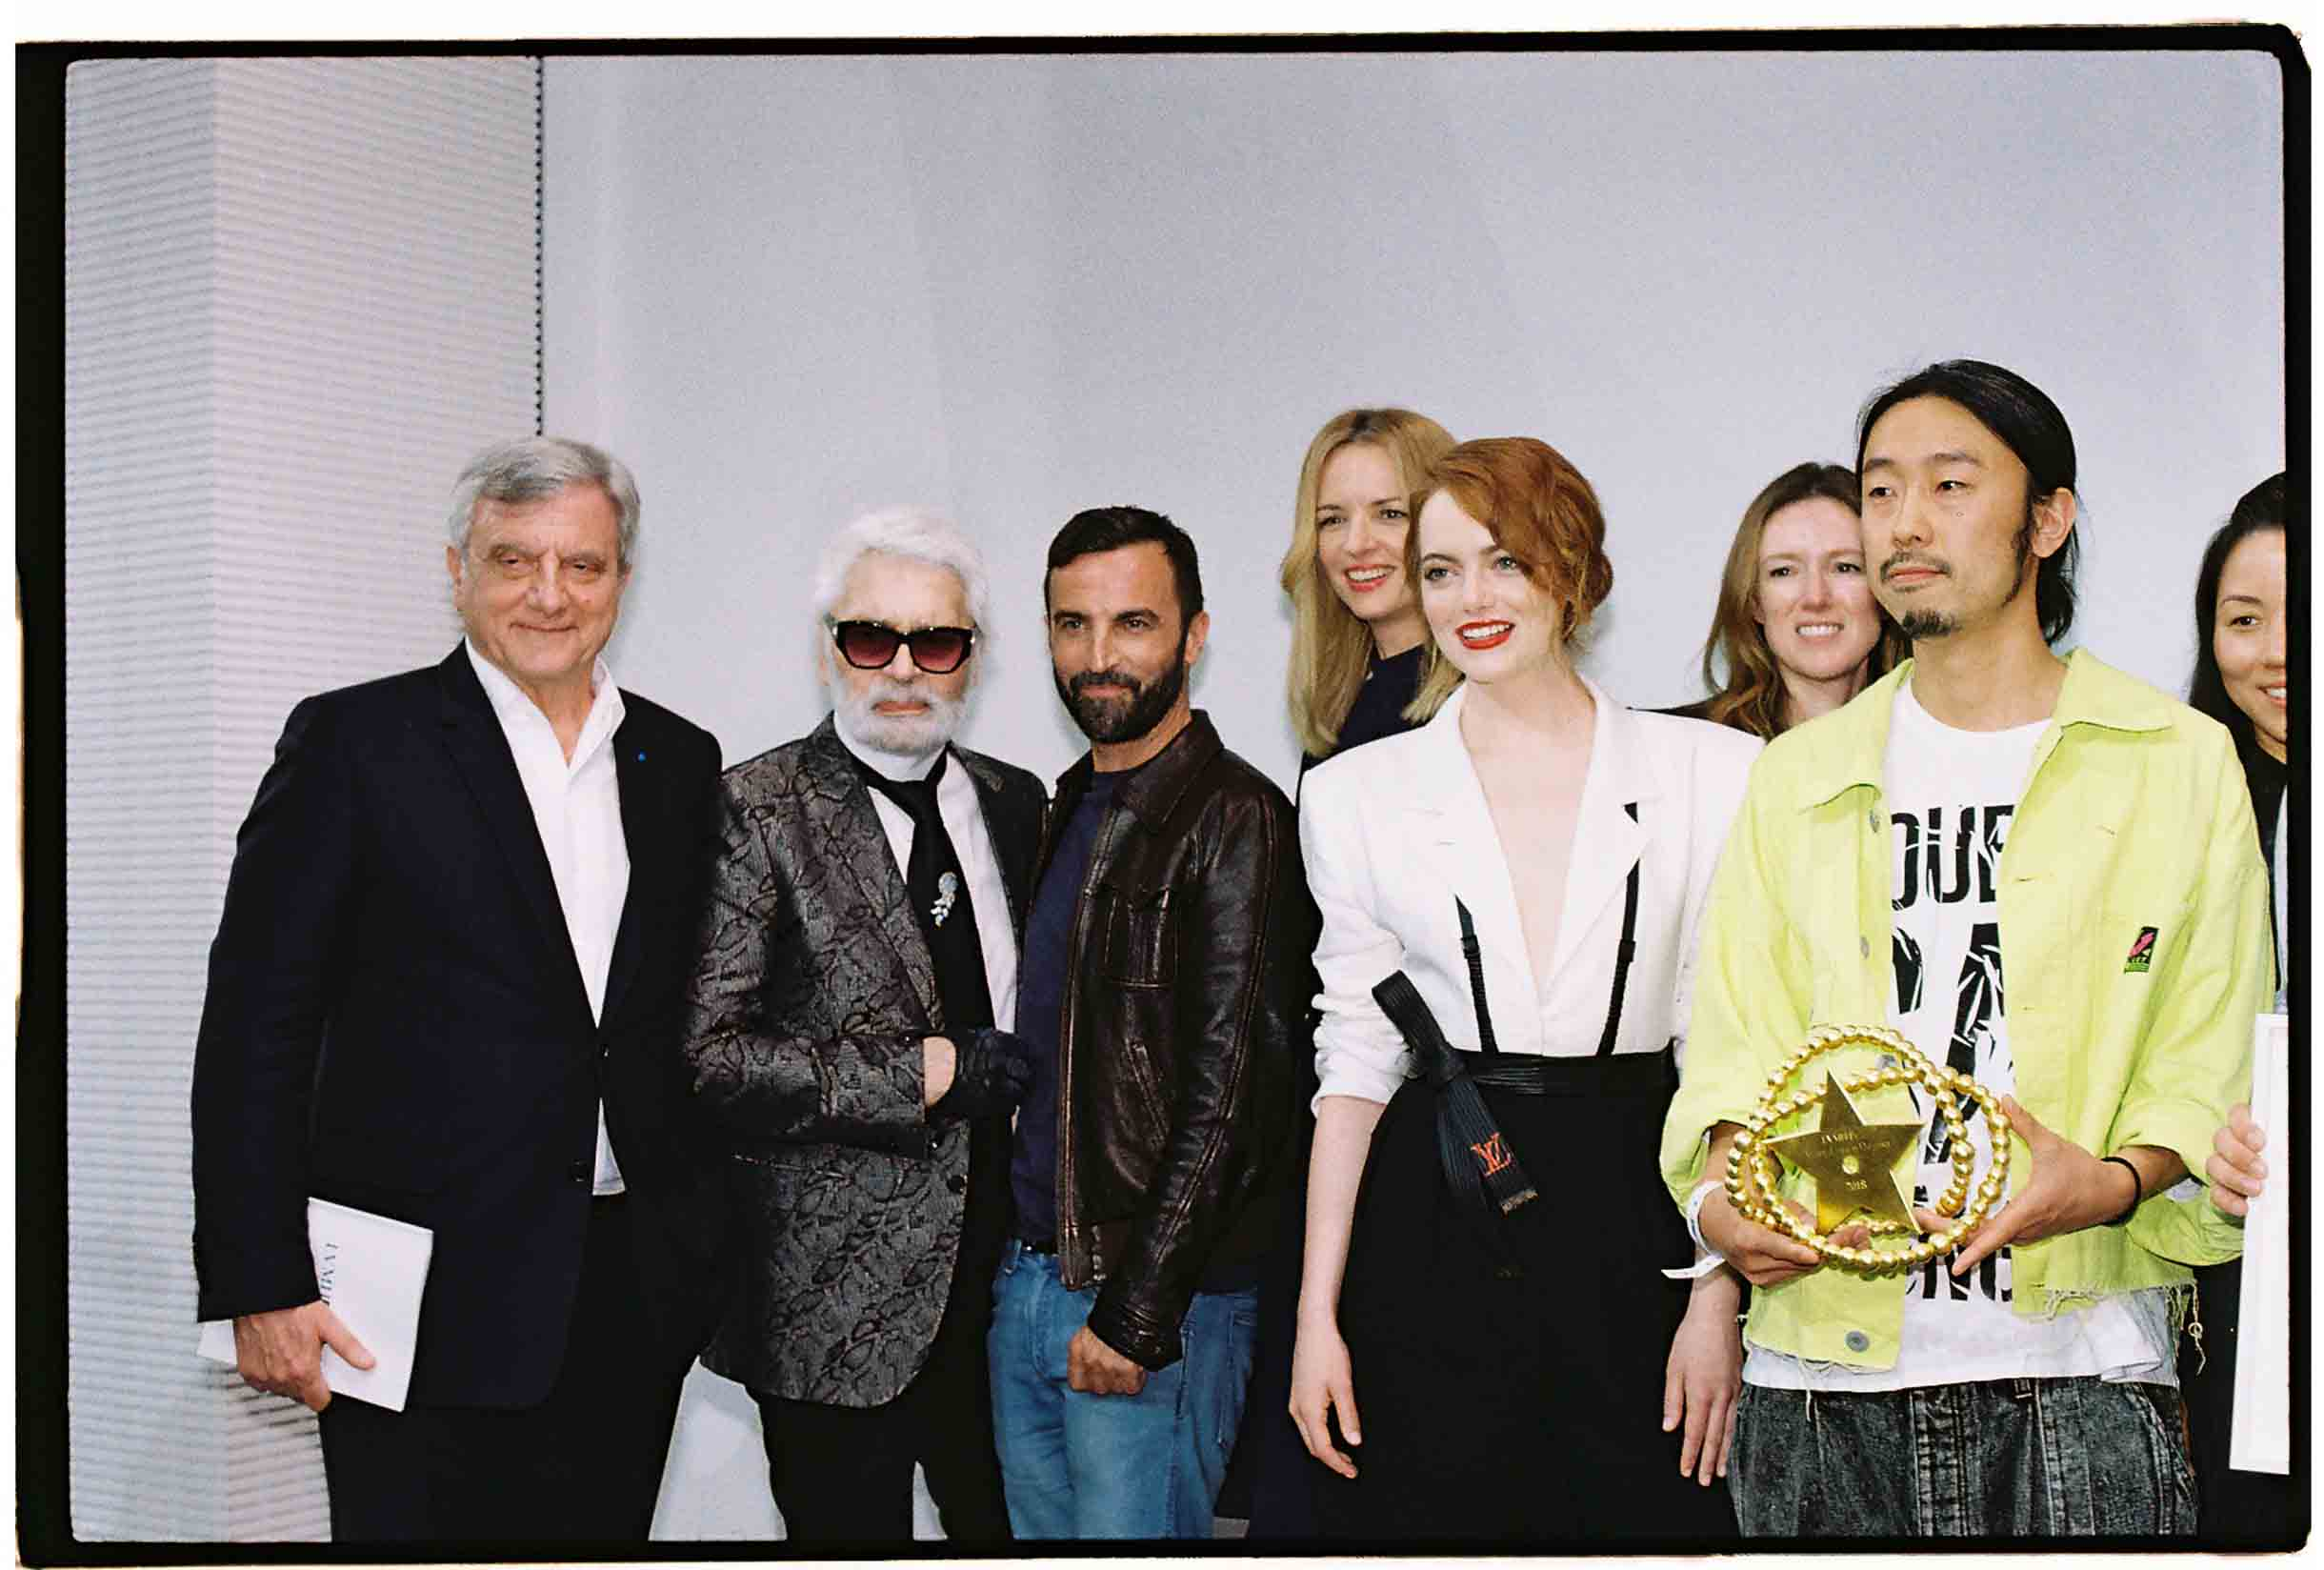 Sidney Toledano, Karl Lagerfeld, Nicolas Ghesquière, Delphine Arnault, Emma Stone, Clare Waight Keller, Masayuki Ino, Carol Lim